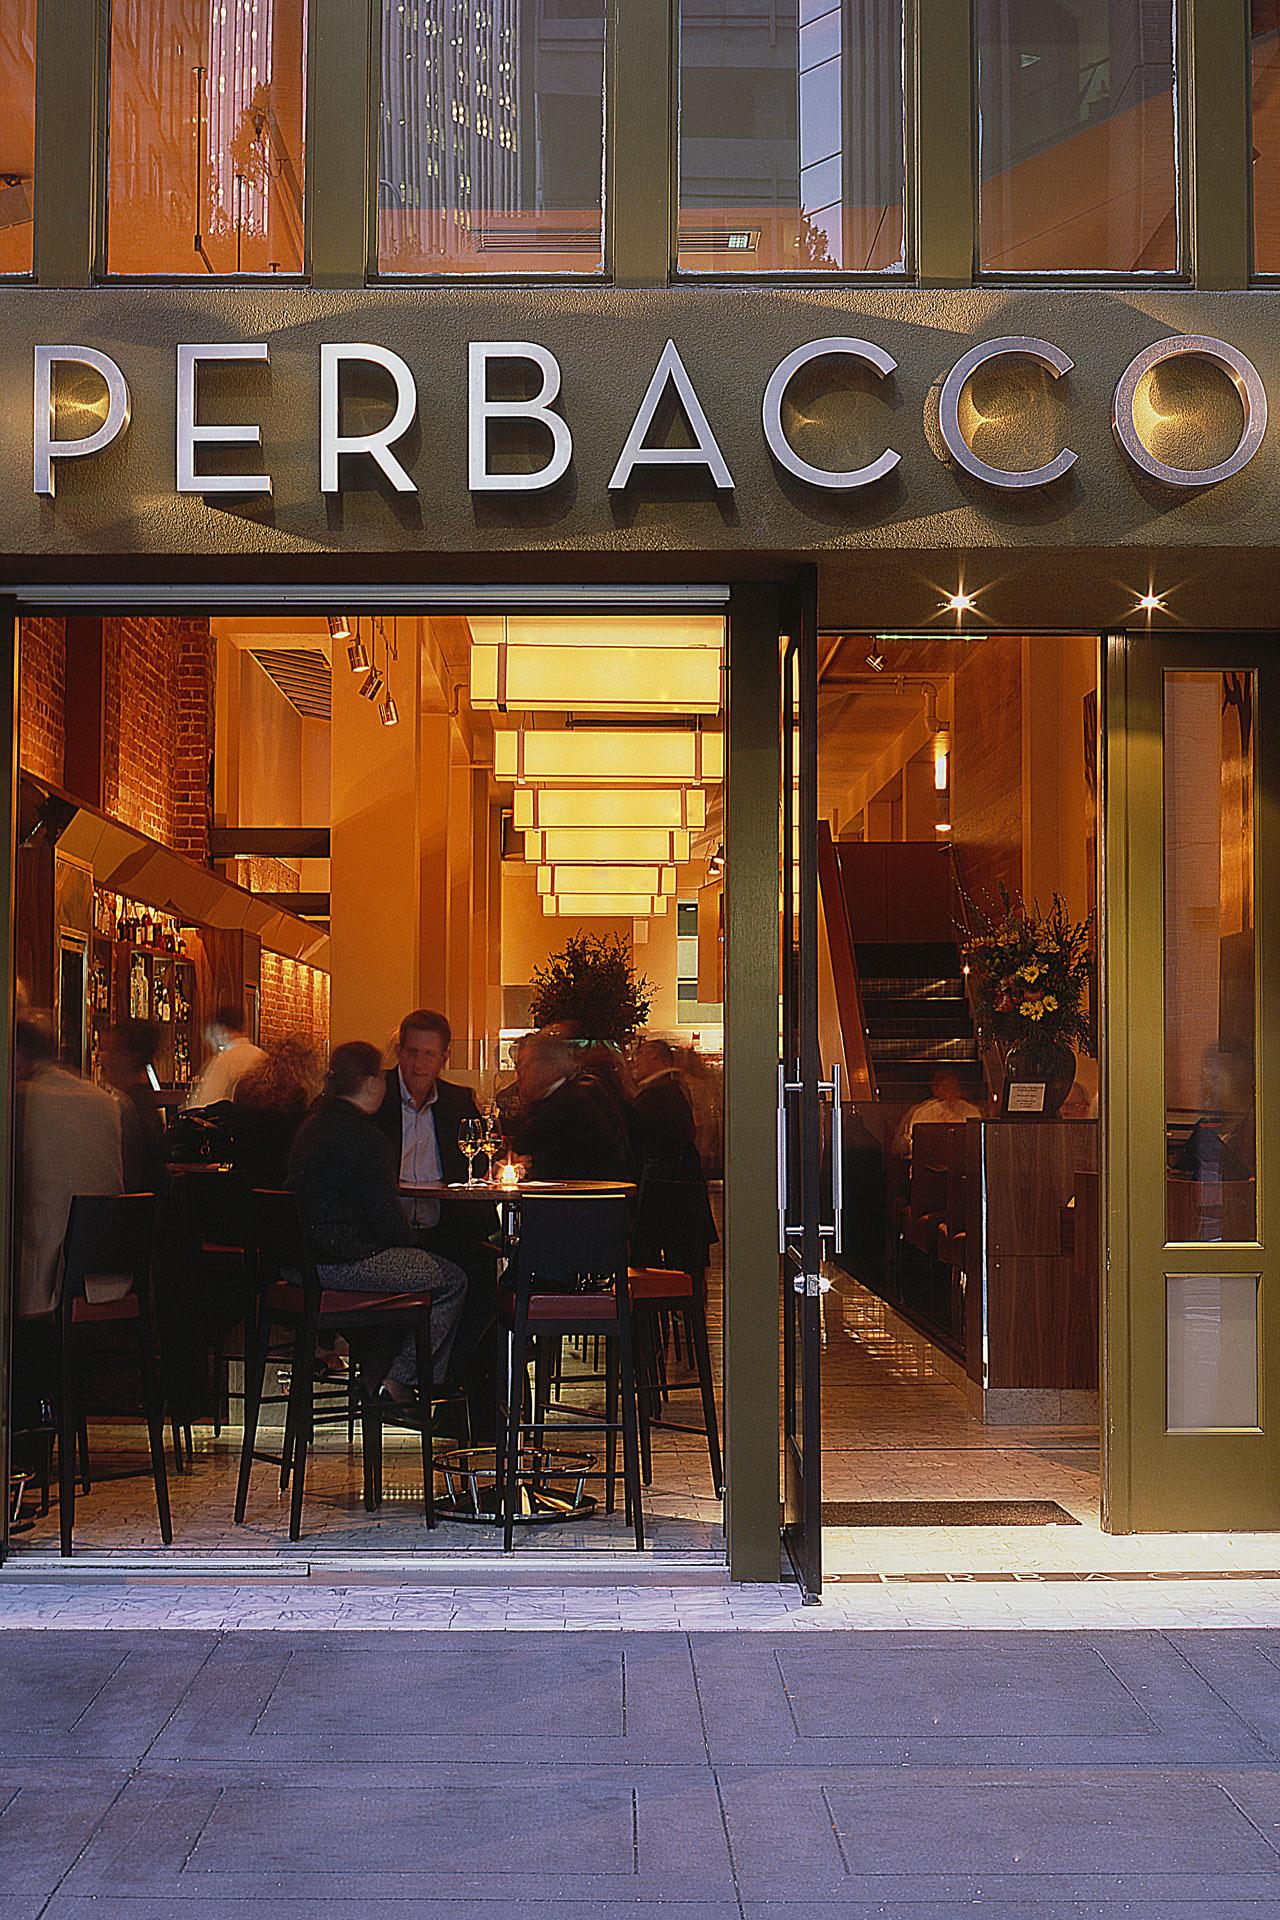 Perbacco restaurant